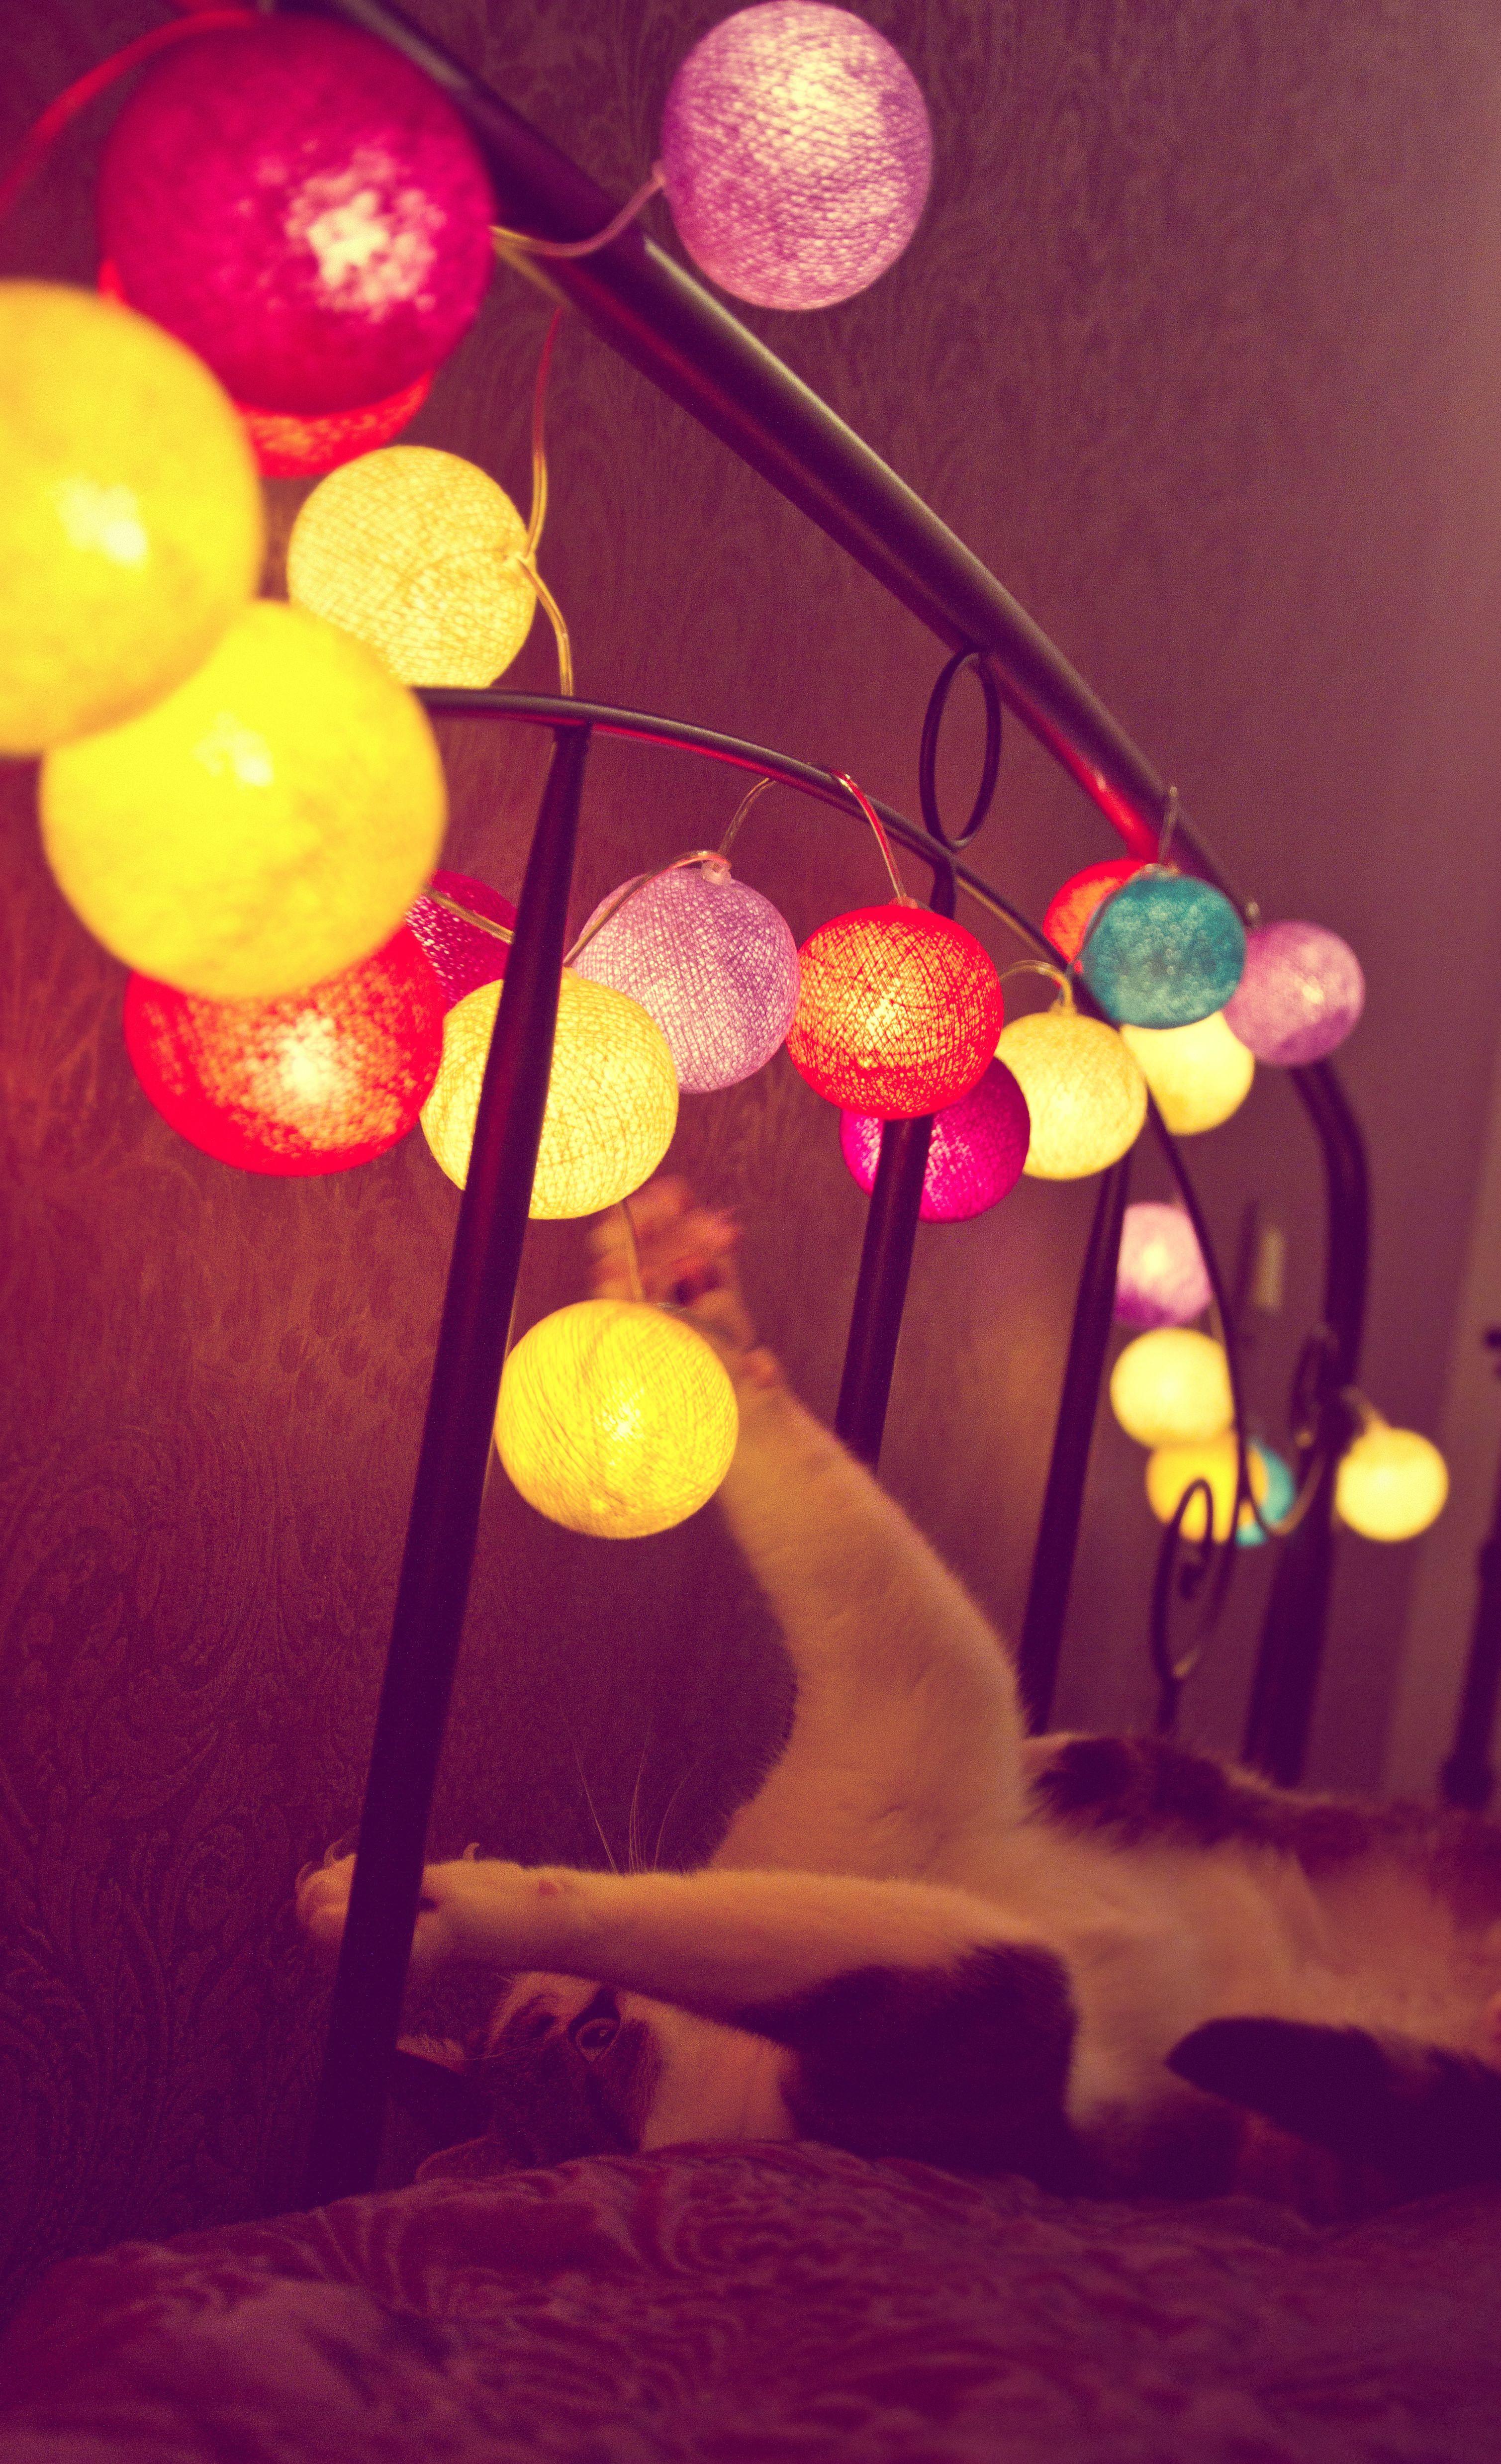 Decorative Ball Lights Cotton Ball Lights  Products I Love  Pinterest  Cotton Ball